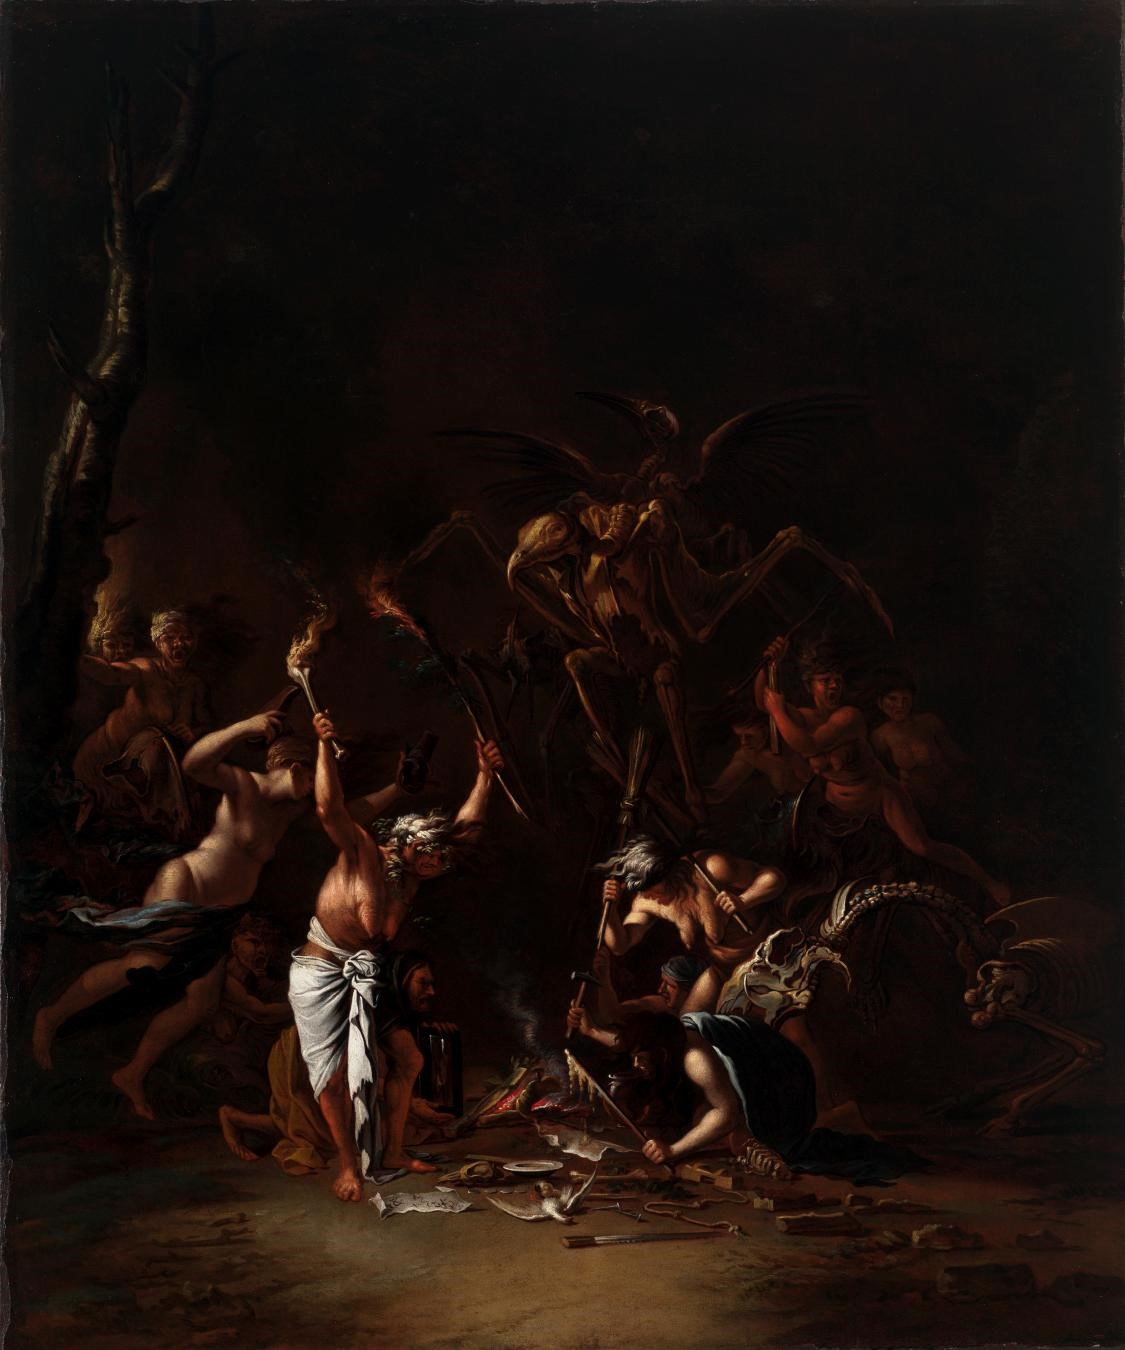 Salvator Rosa, The Witches' Sabbath, c. 1640–49